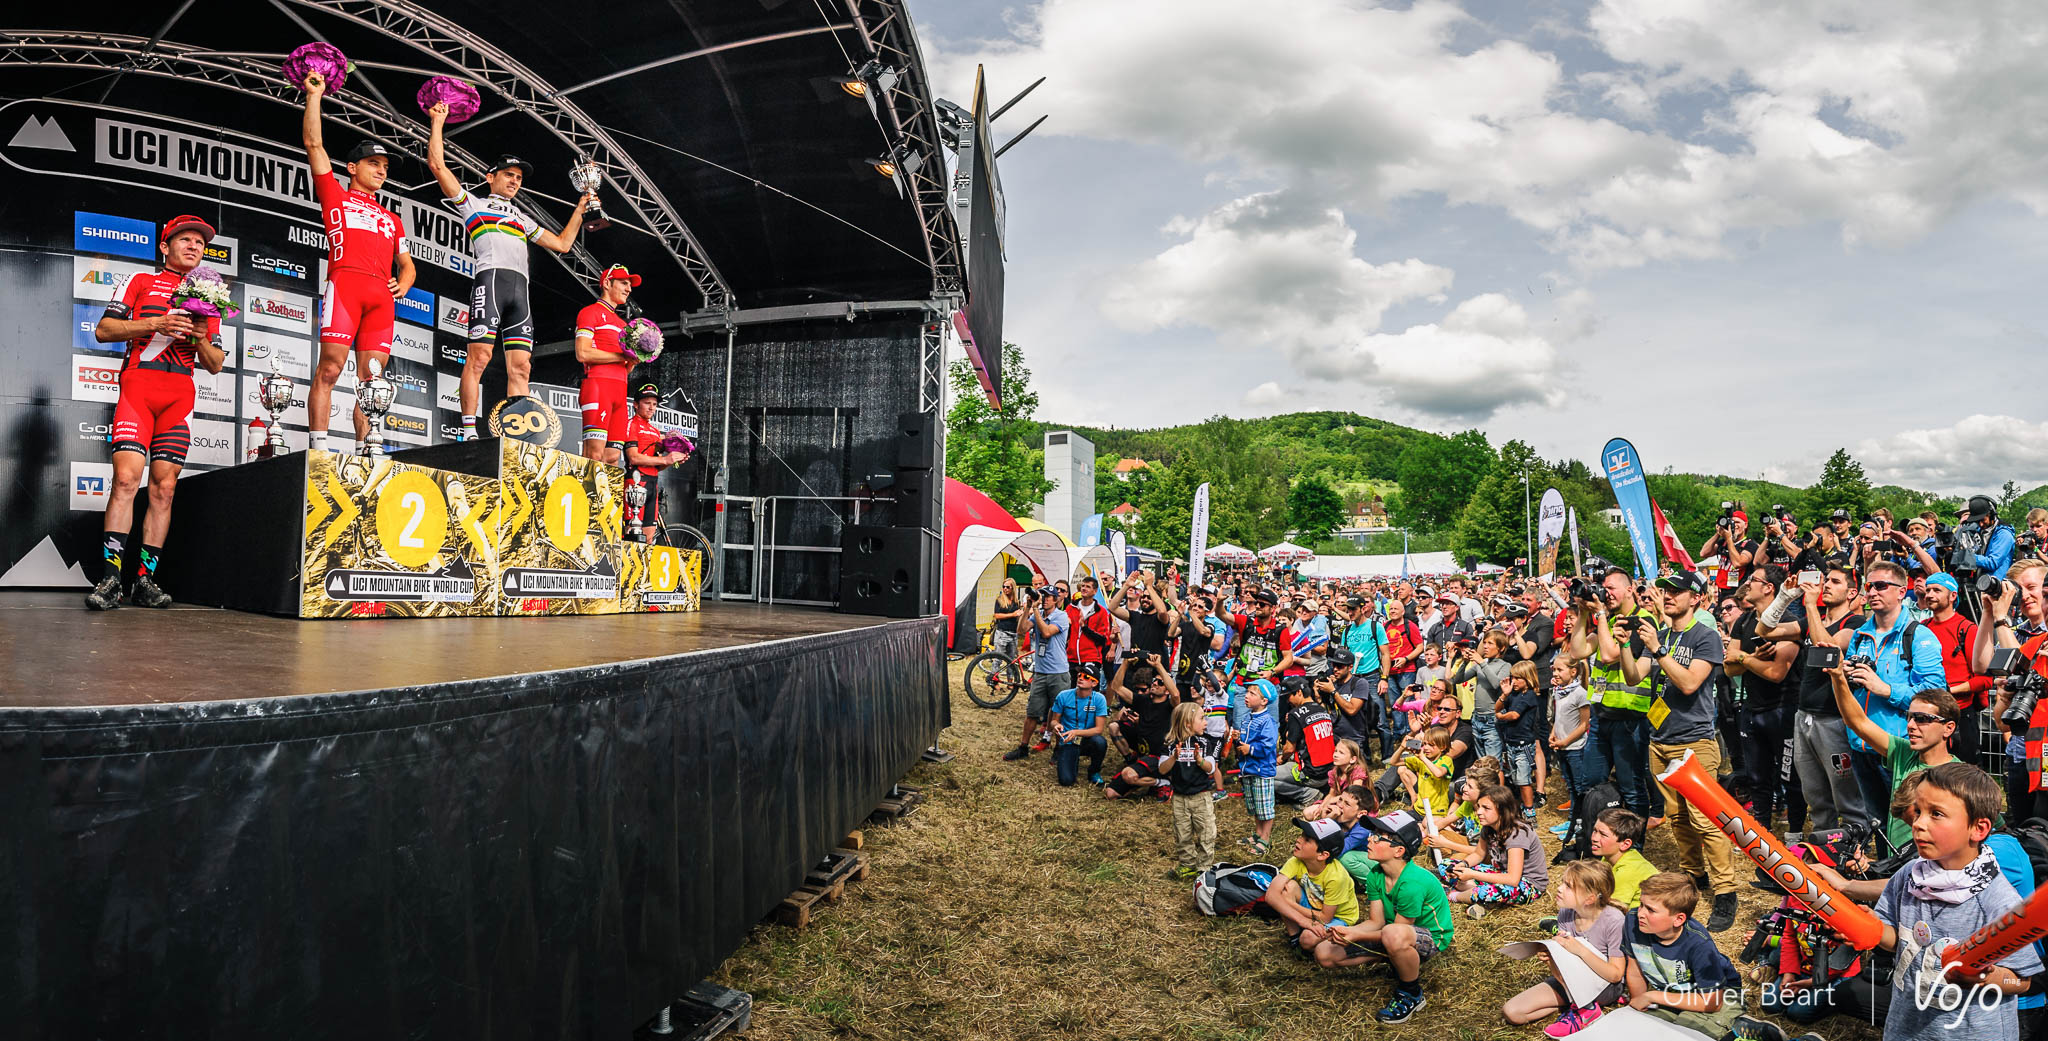 World_Cup_Albstadt_2015_Hommes_Schurter_Absalon_Copyright_OBeart_VojoMag-25